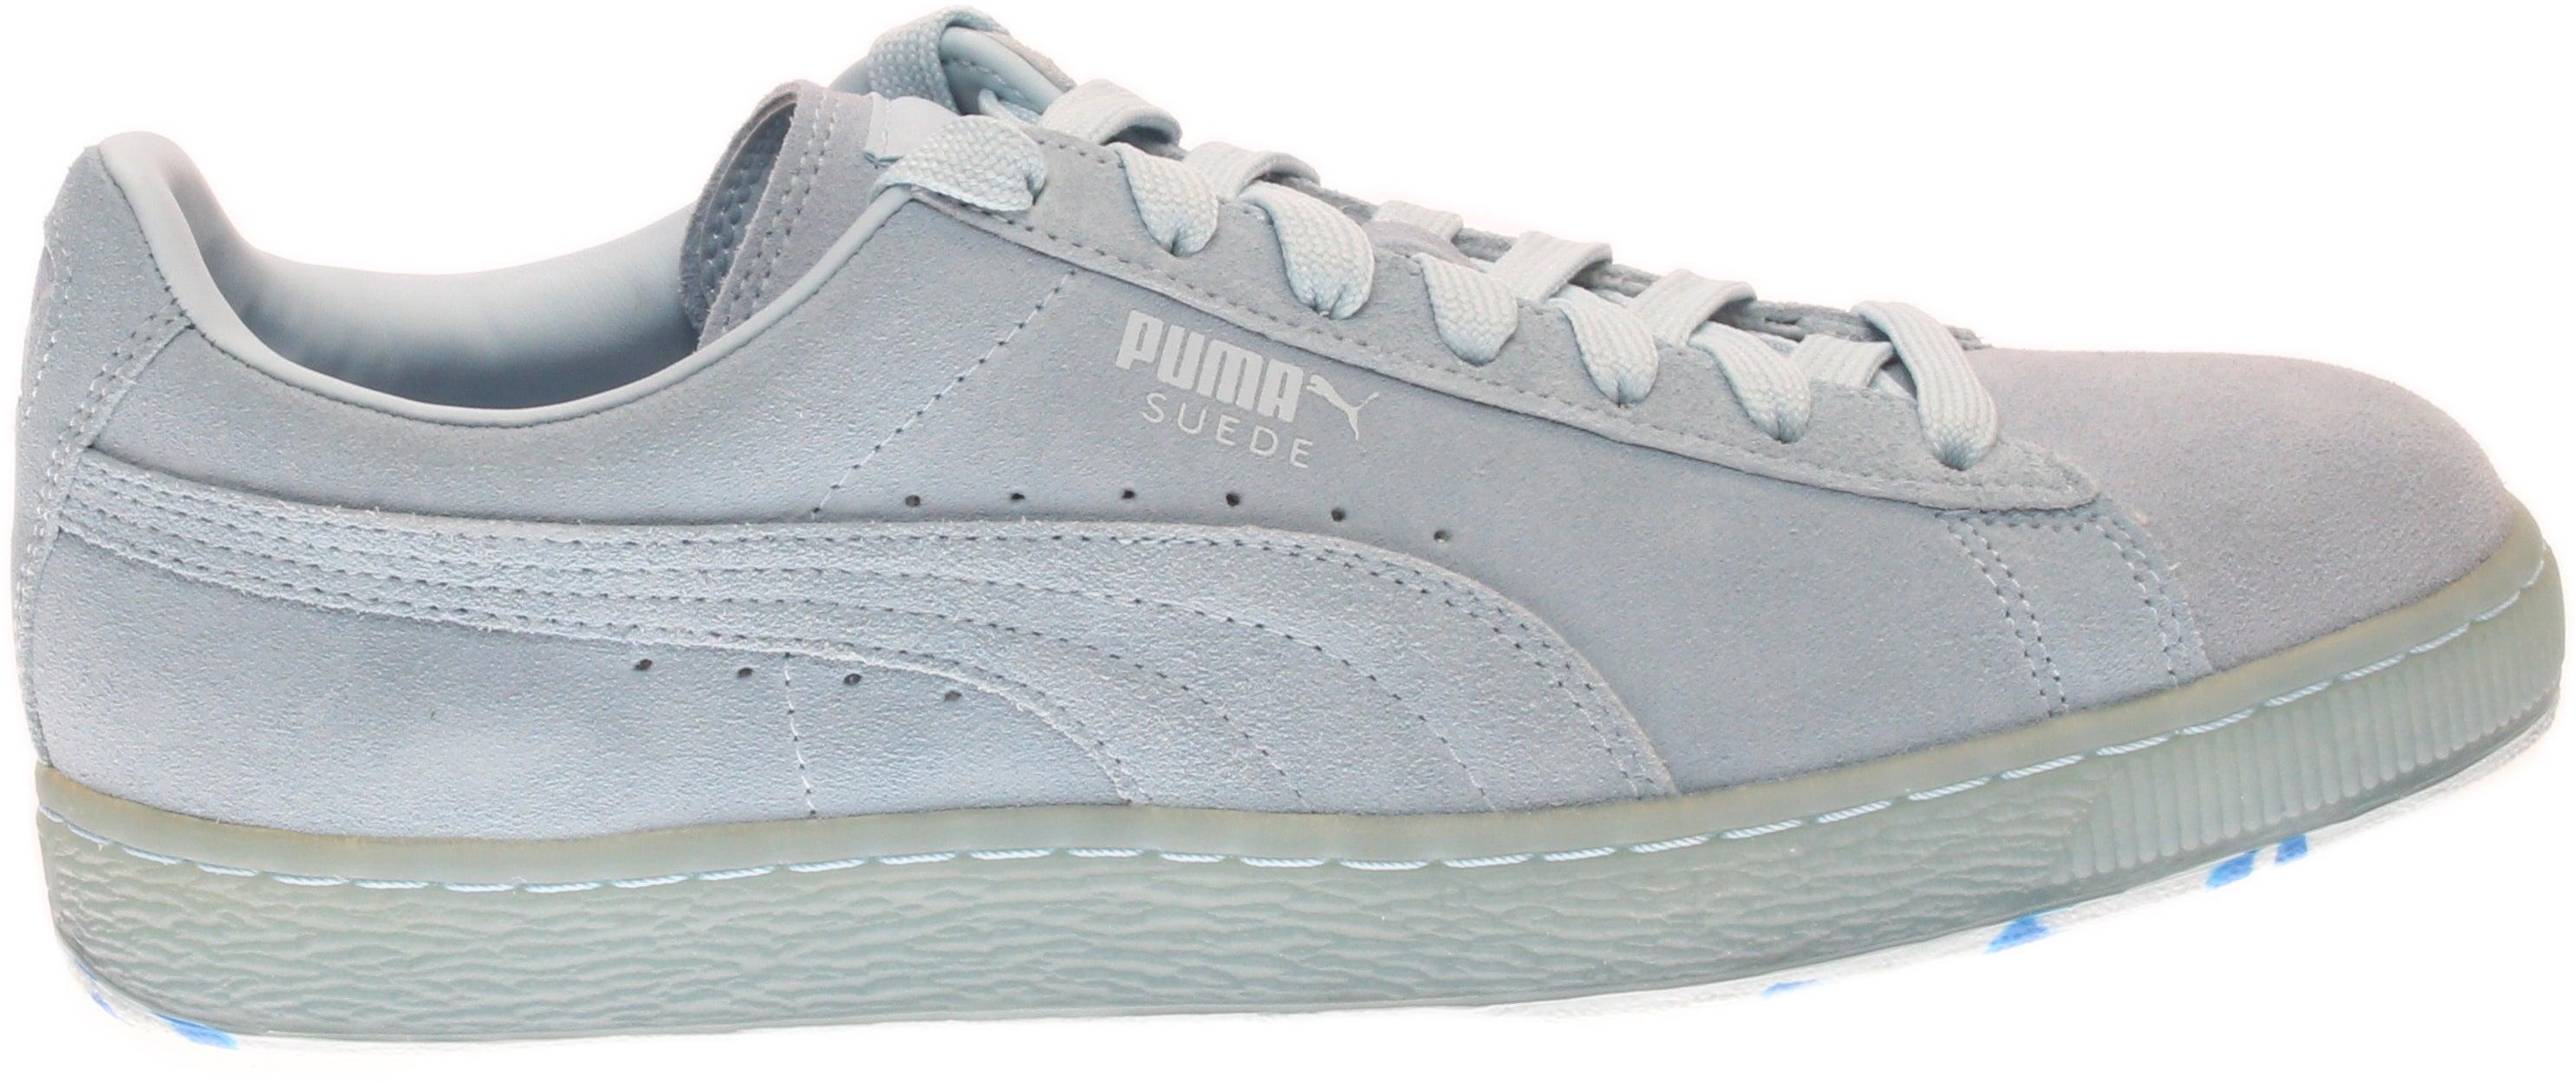 ca73e822eec1 Puma Suede Classic Ice Mix Sneakers - Blue - Mens